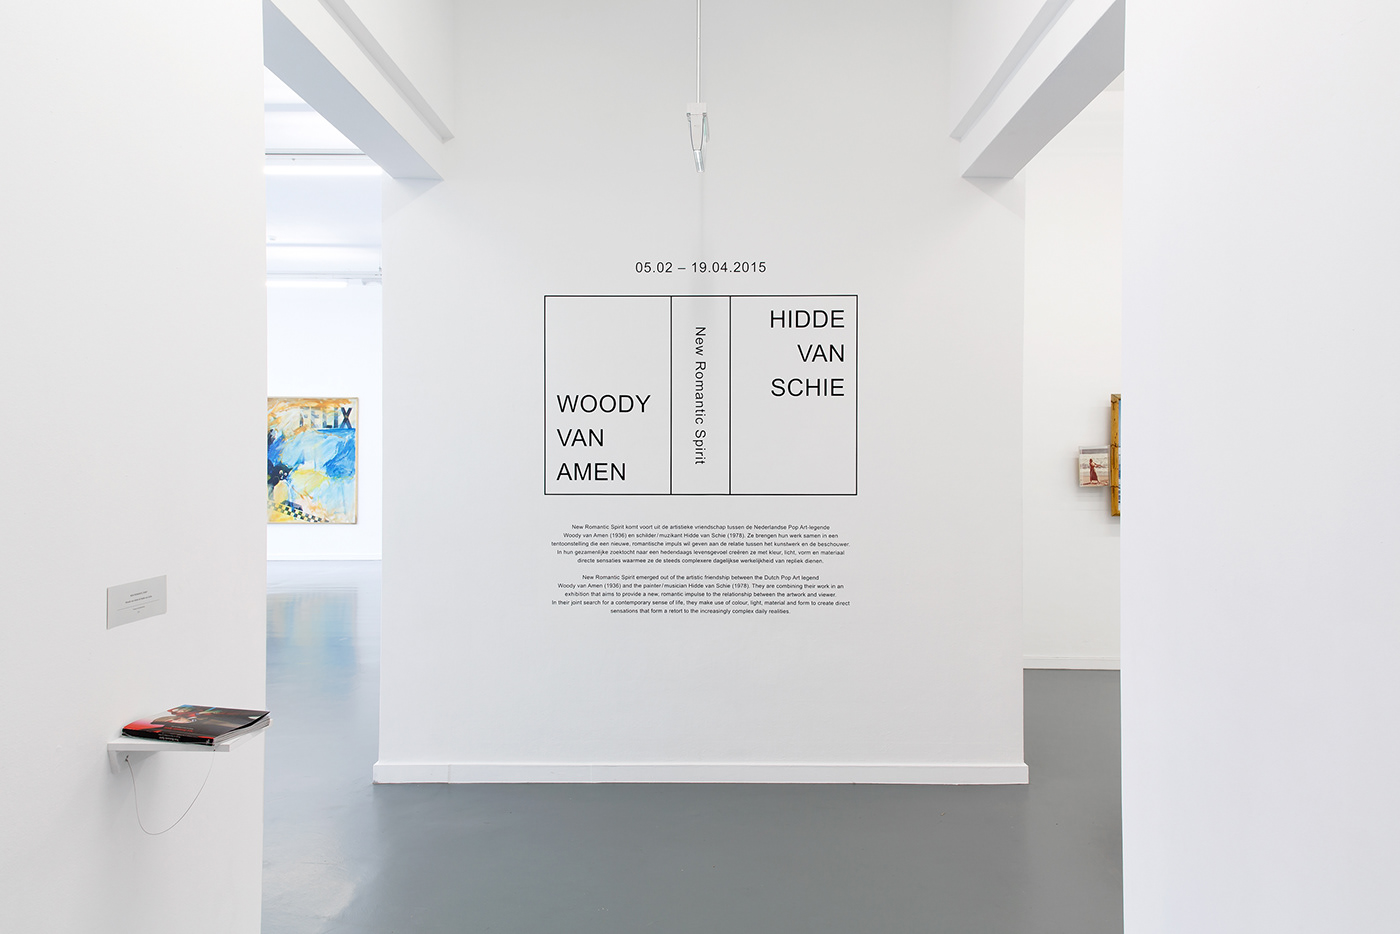 graphic design  Exhibition  contemporary art